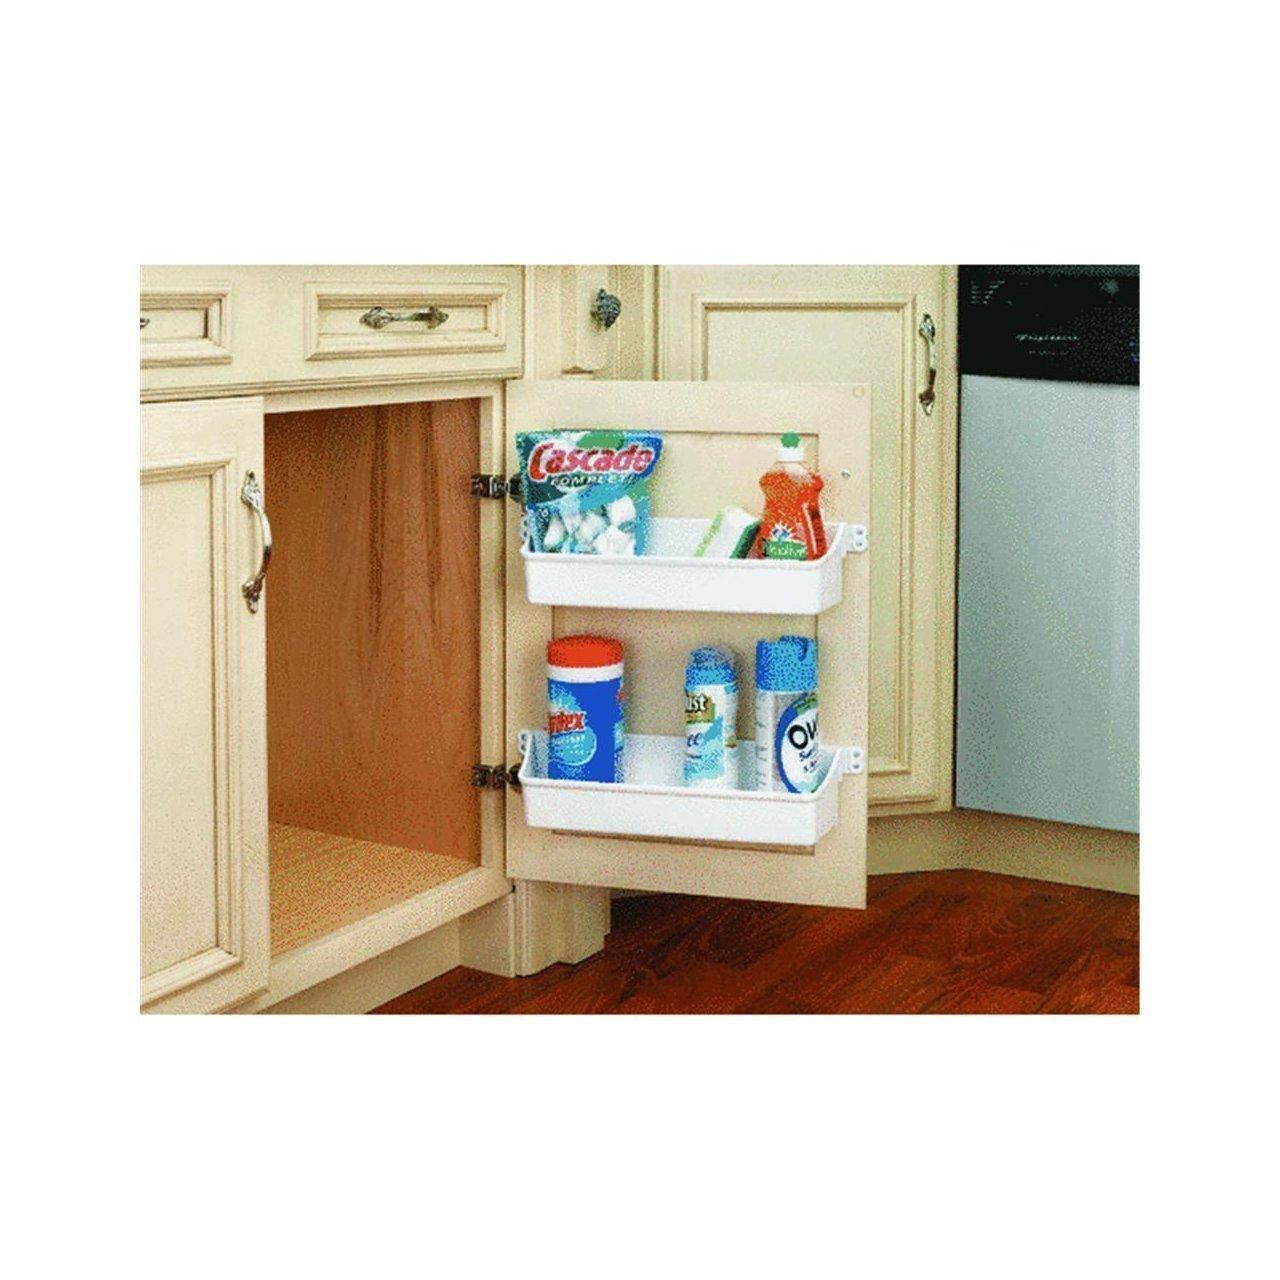 Generic YC-US2-151027-158 <8&25231> ack USACabinet 2 W Door Storage Home Cabinet 2 White Plastic Kitchen Shelf Organizer Tray Rack USA Home Kitche